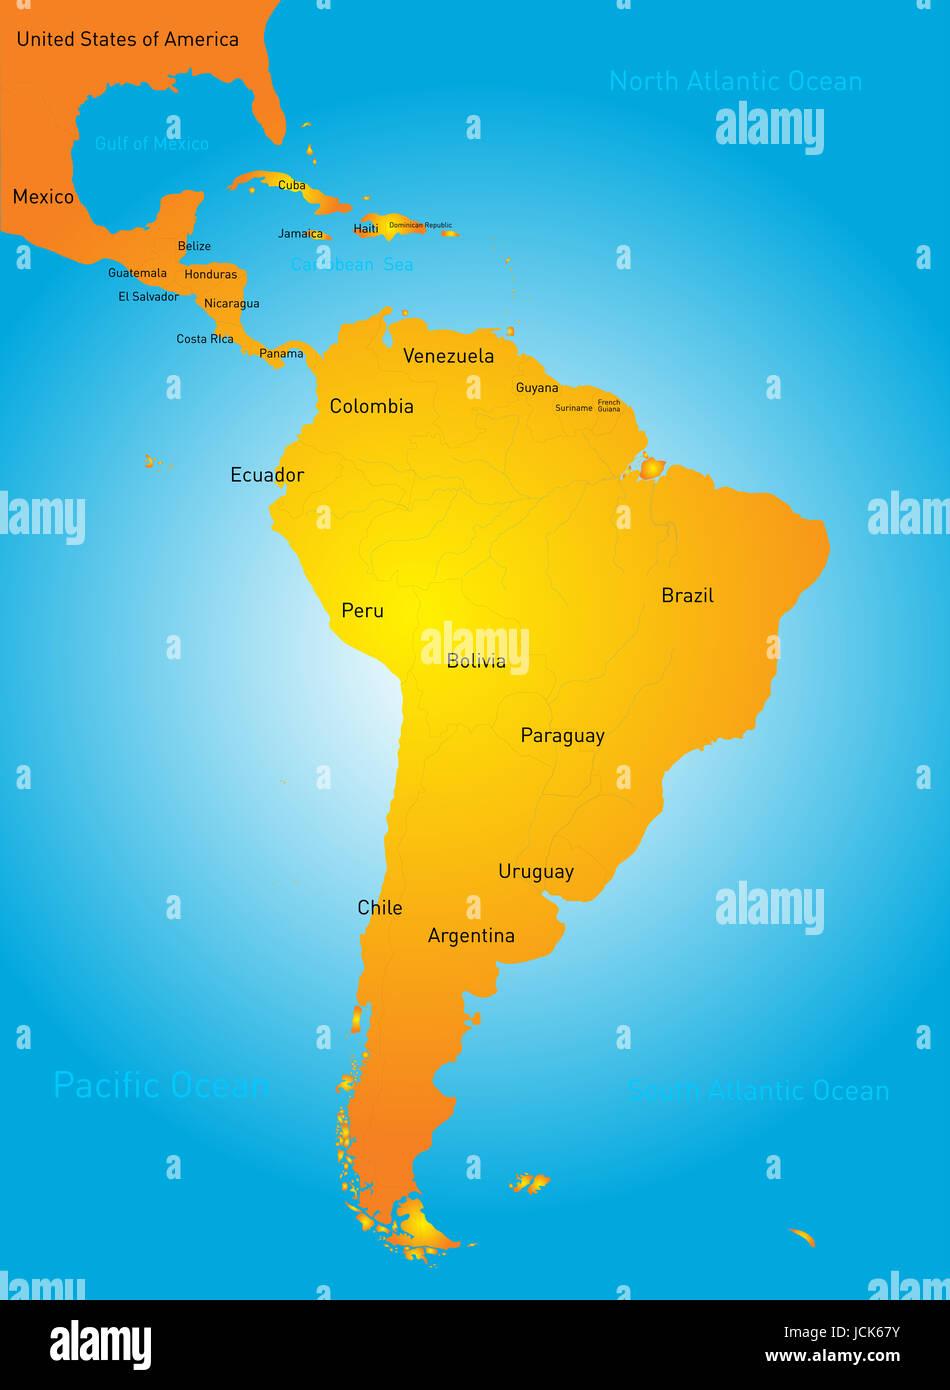 Latin American Countries Map Stock Photos & Latin American Countries ...